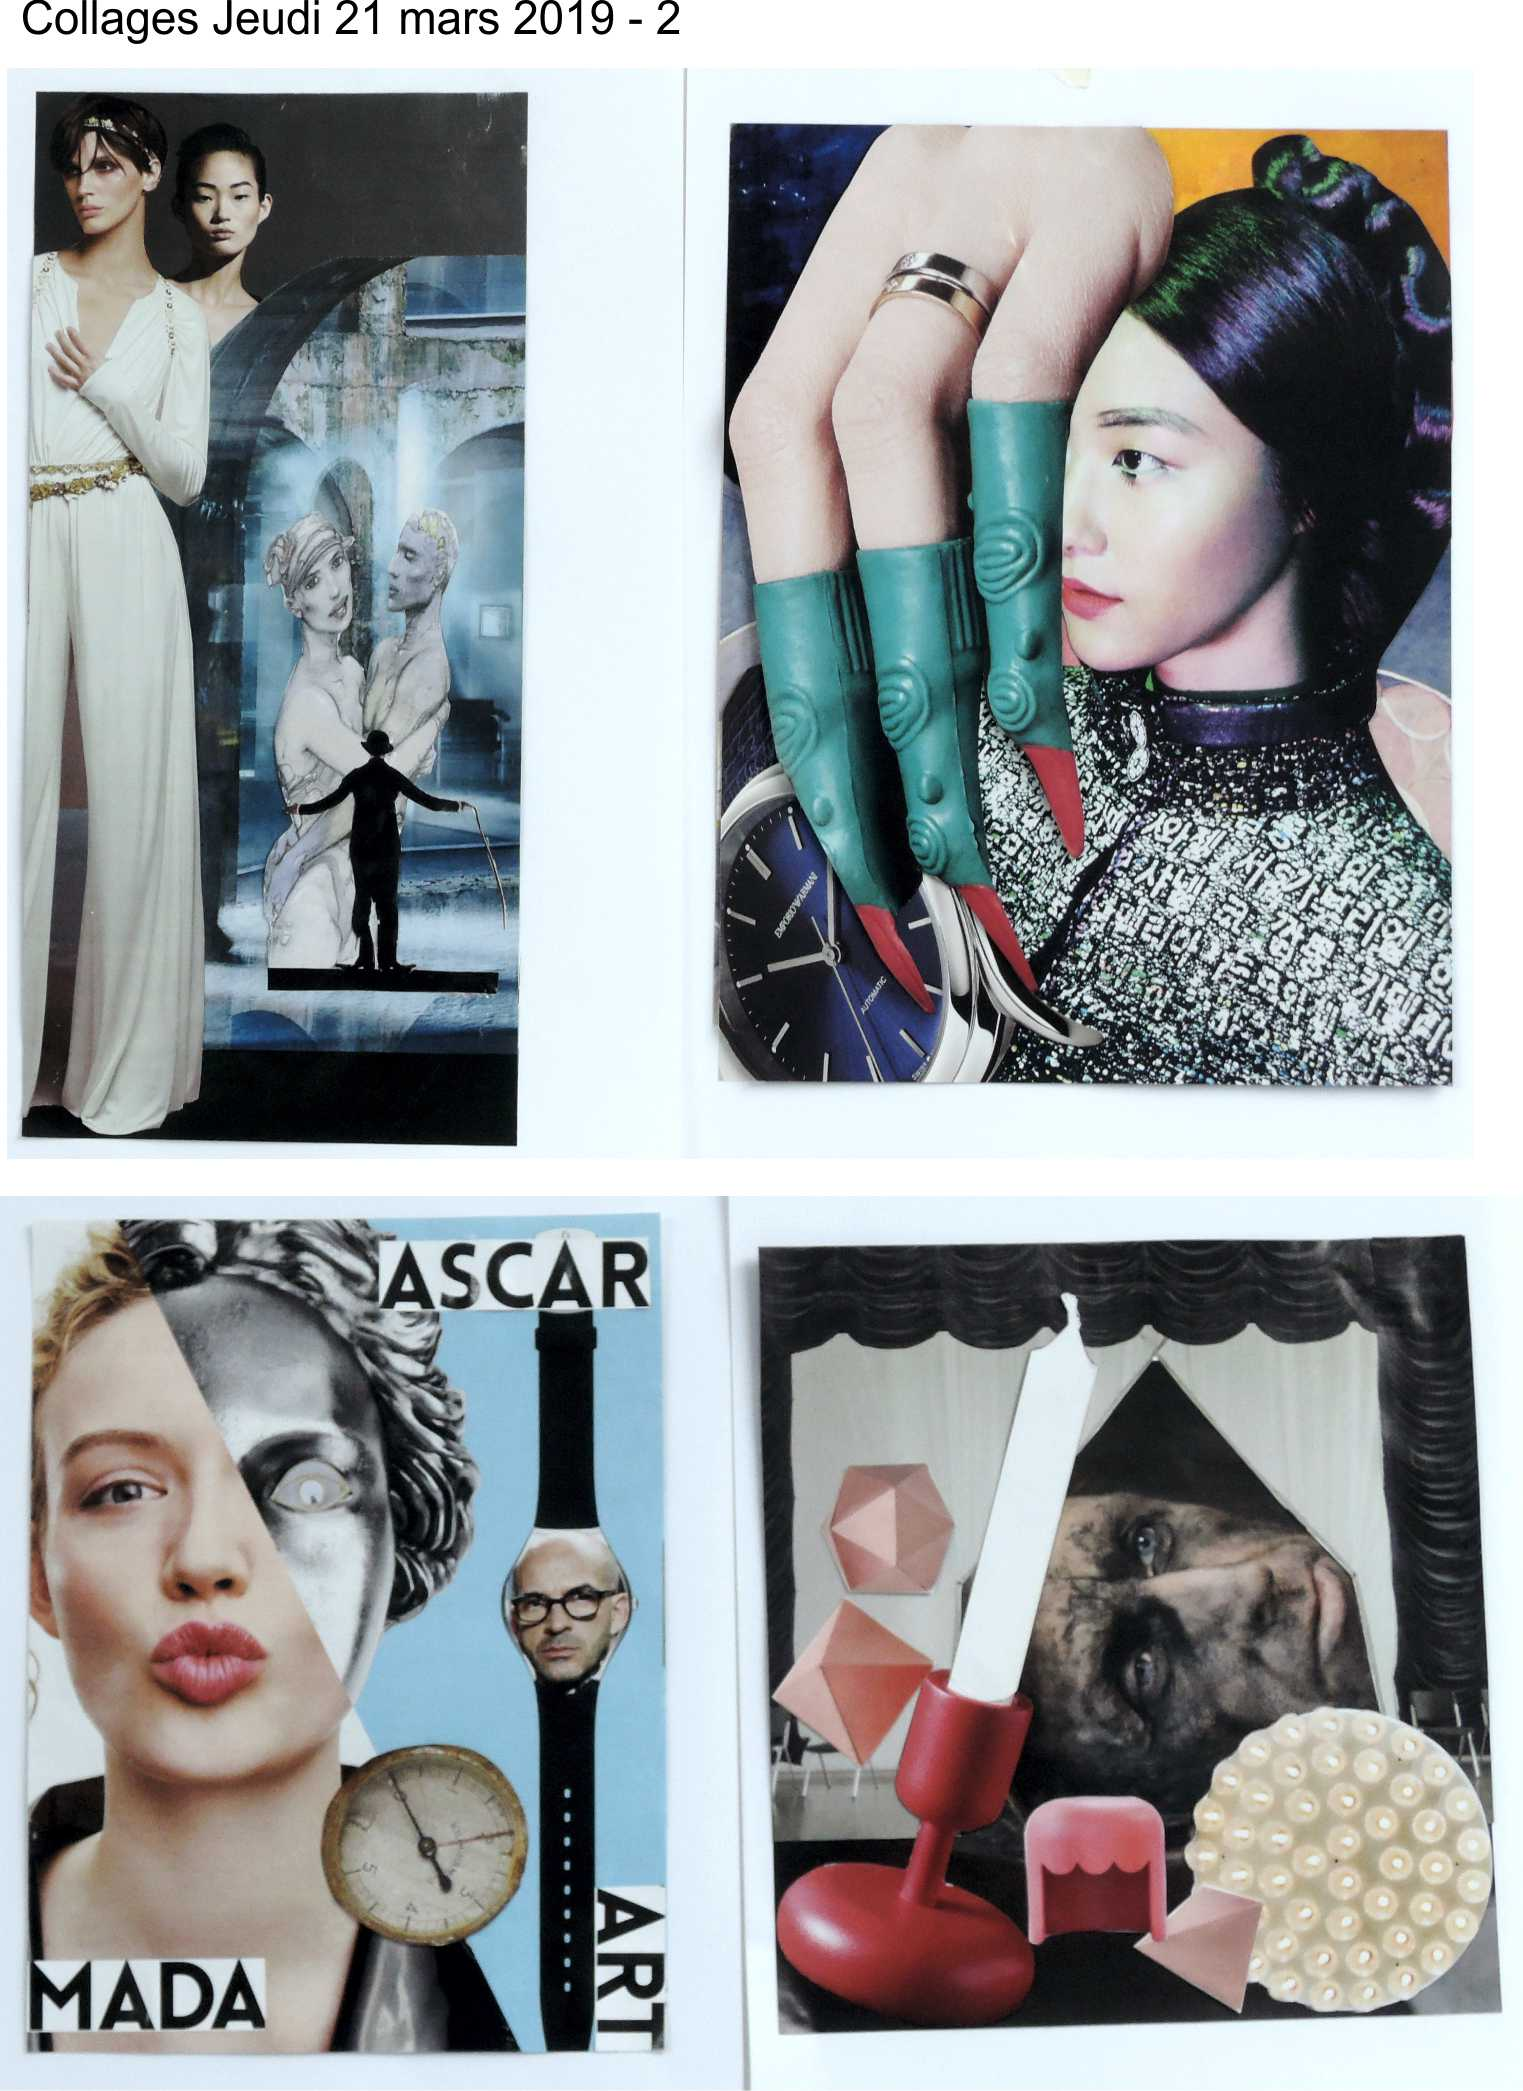 Collages jeudi 21 mars Raoul Hausmann 2